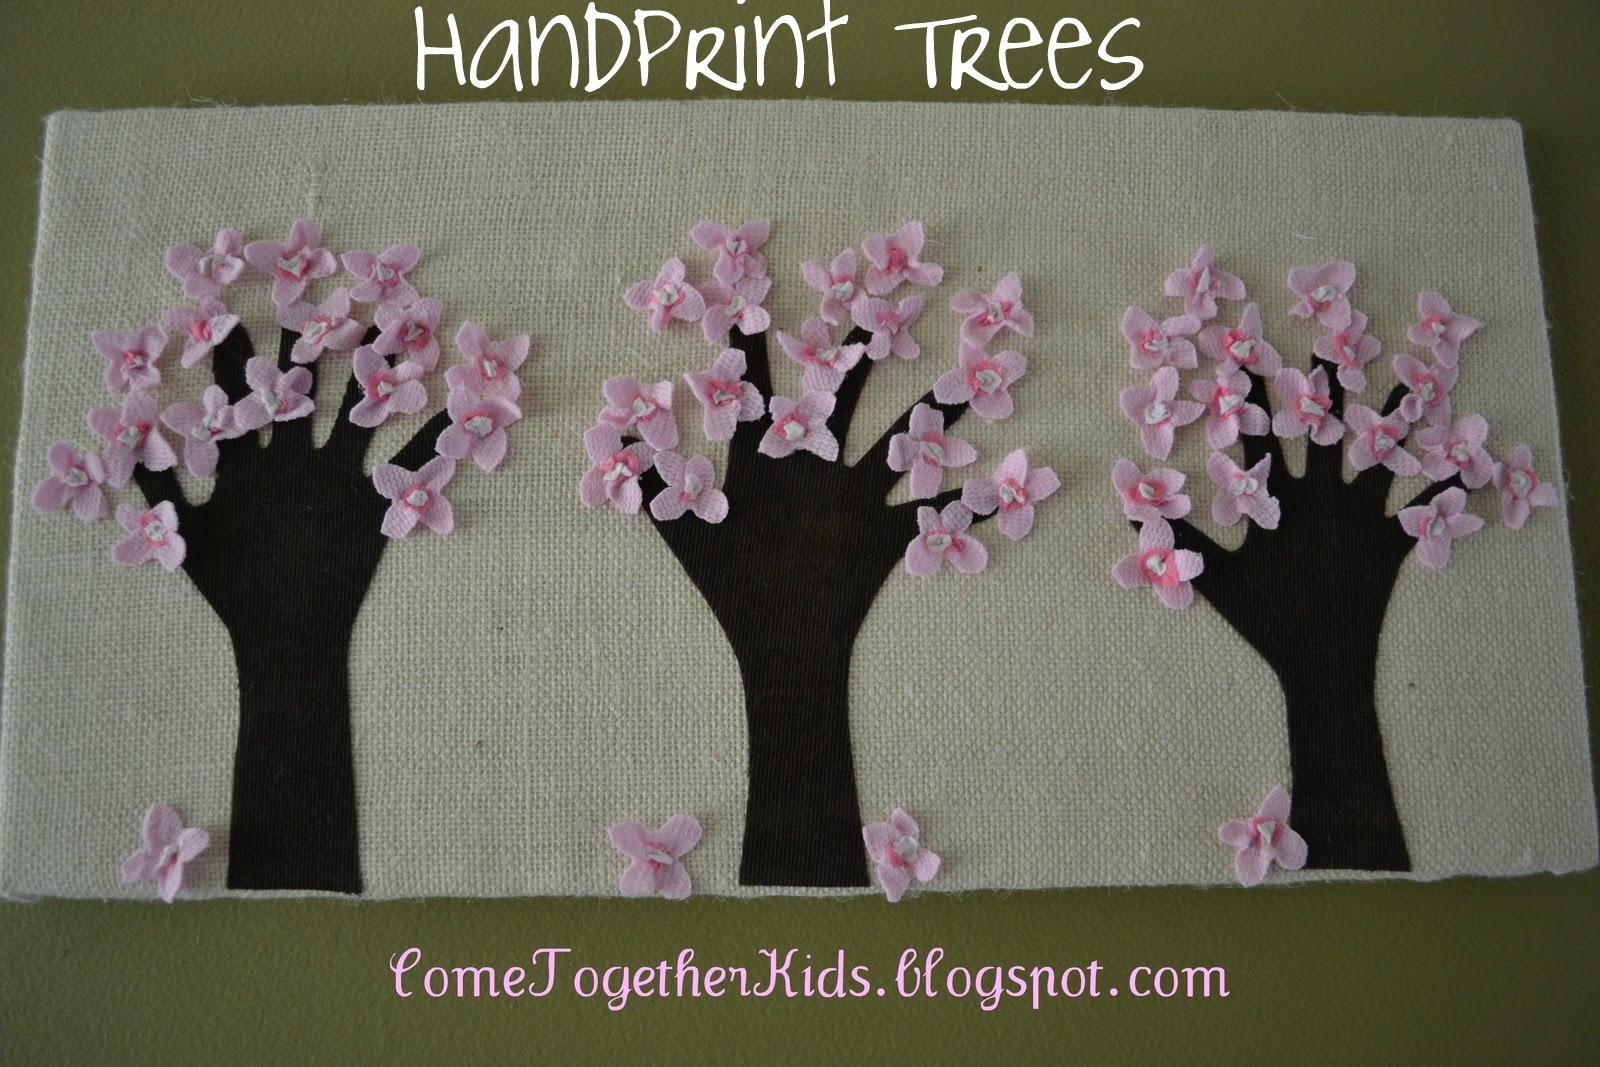 Grandparent's Day Gift Ideas - FindGift.com